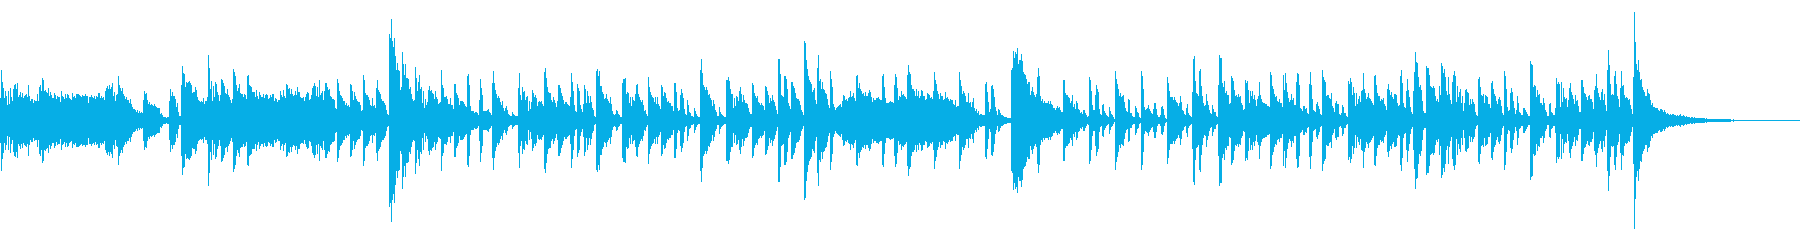 LUNARTIC TECHNO-POPの再生済みの波形